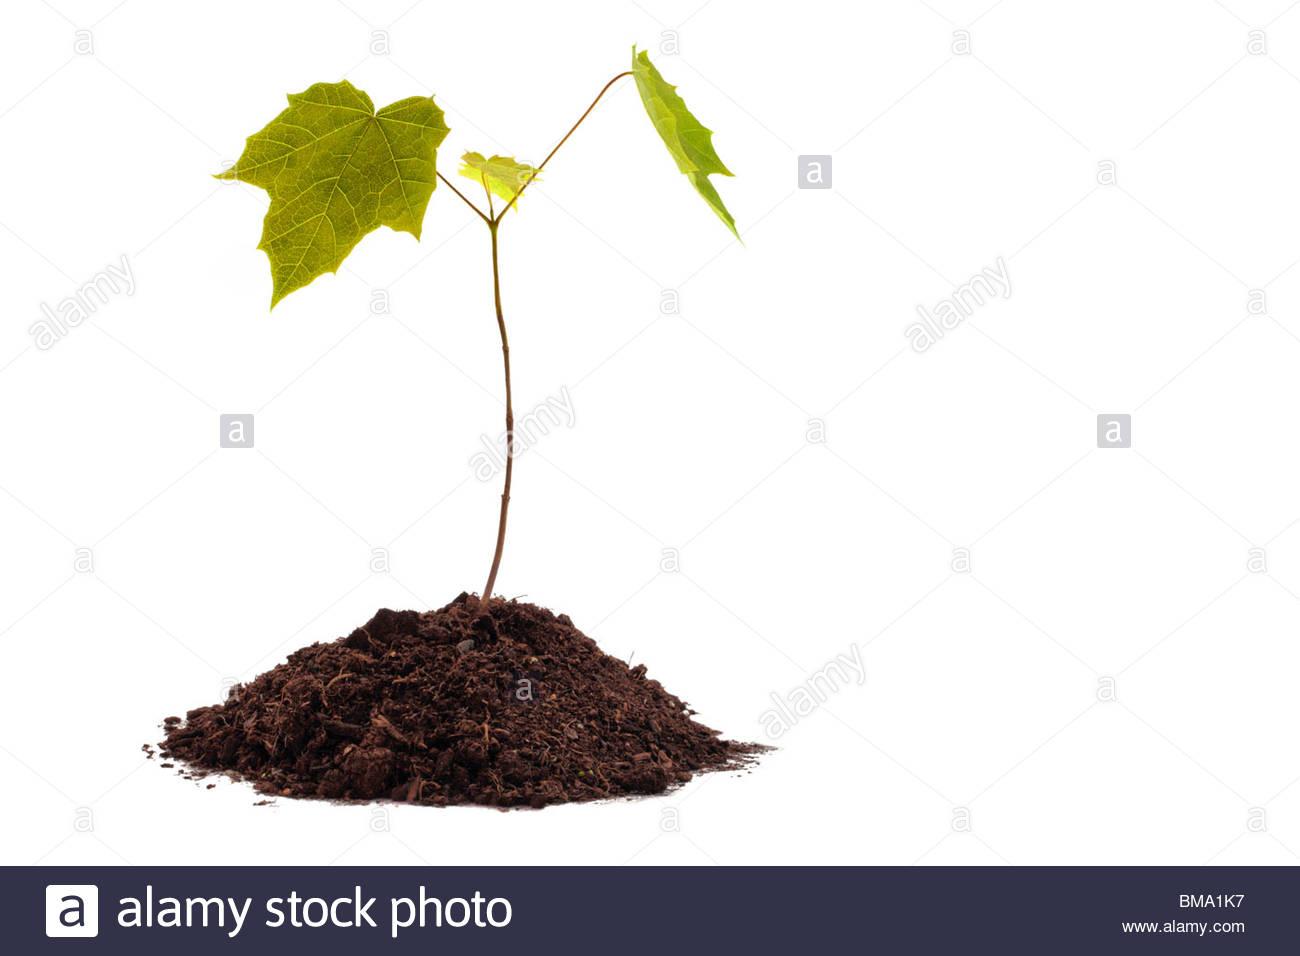 Maple sapling in soil on white background Stock Photo 29724331 1300x956